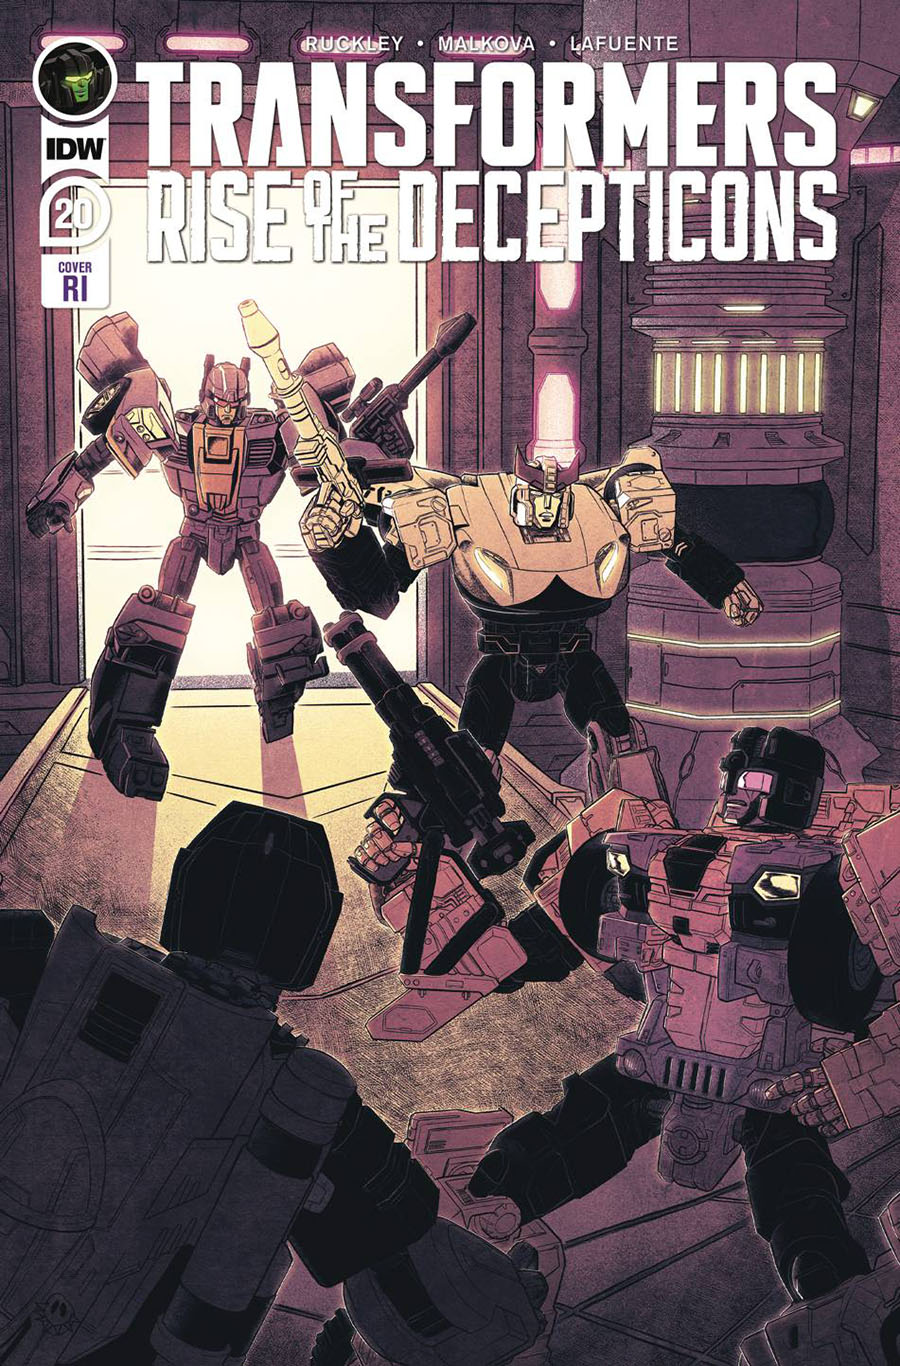 Transformers Vol 4 #20 Cover C Incentive Billie Montfort & Blacky Shepherd Variant Cover